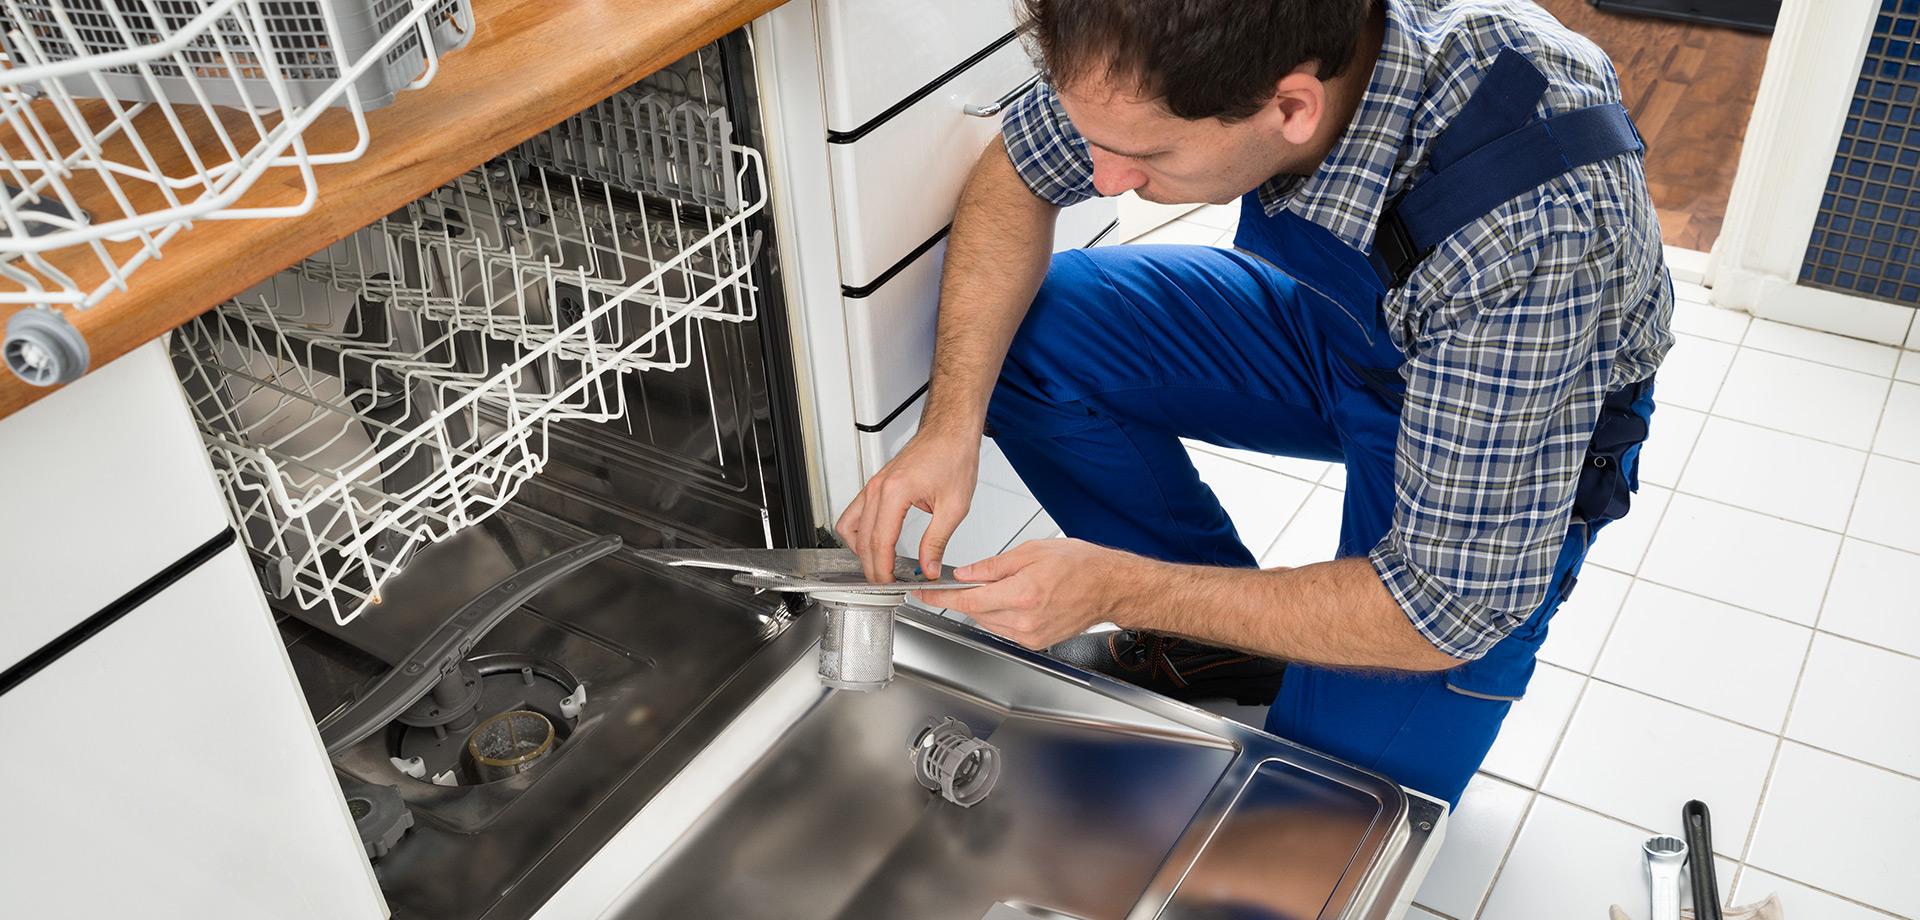 Technician fixing a dishwasher appliance part